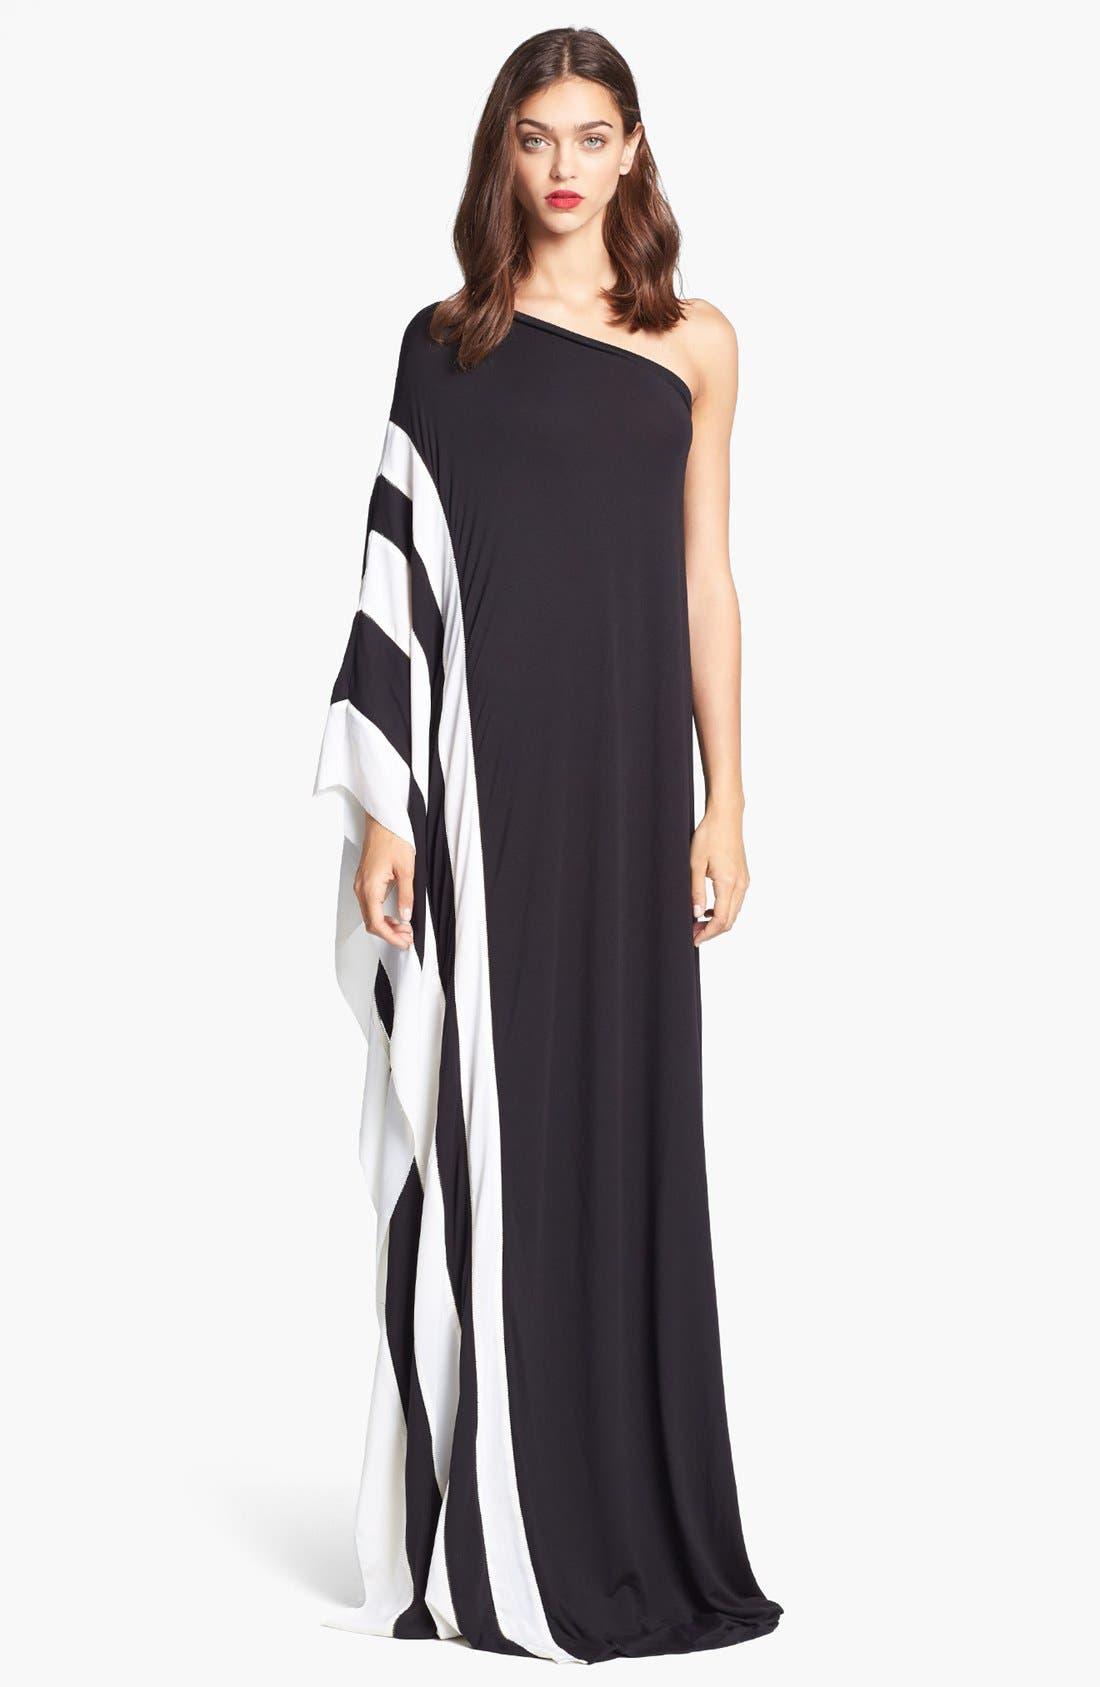 Main Image - Rachel Zoe 'Azur' One Shoulder Jersey Maxi Dress